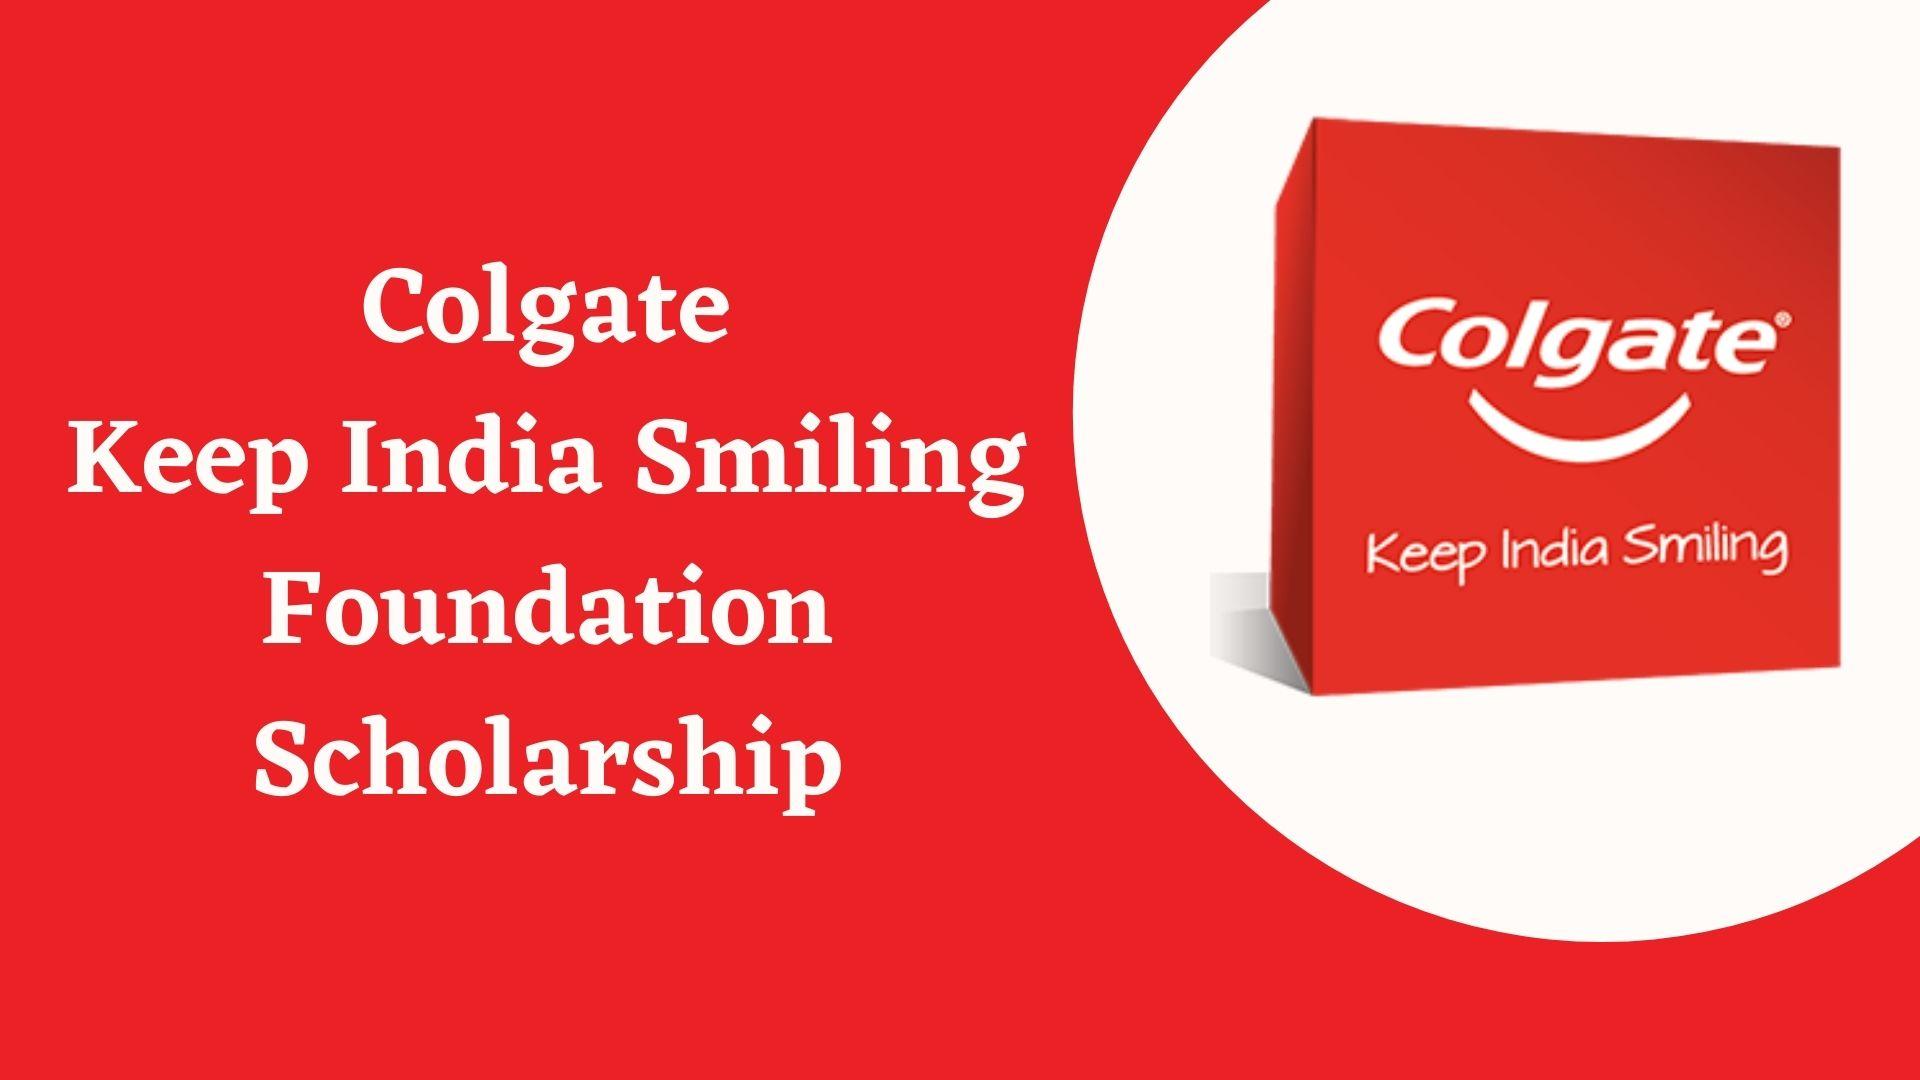 Colgate Scholarship Keep India Smiling